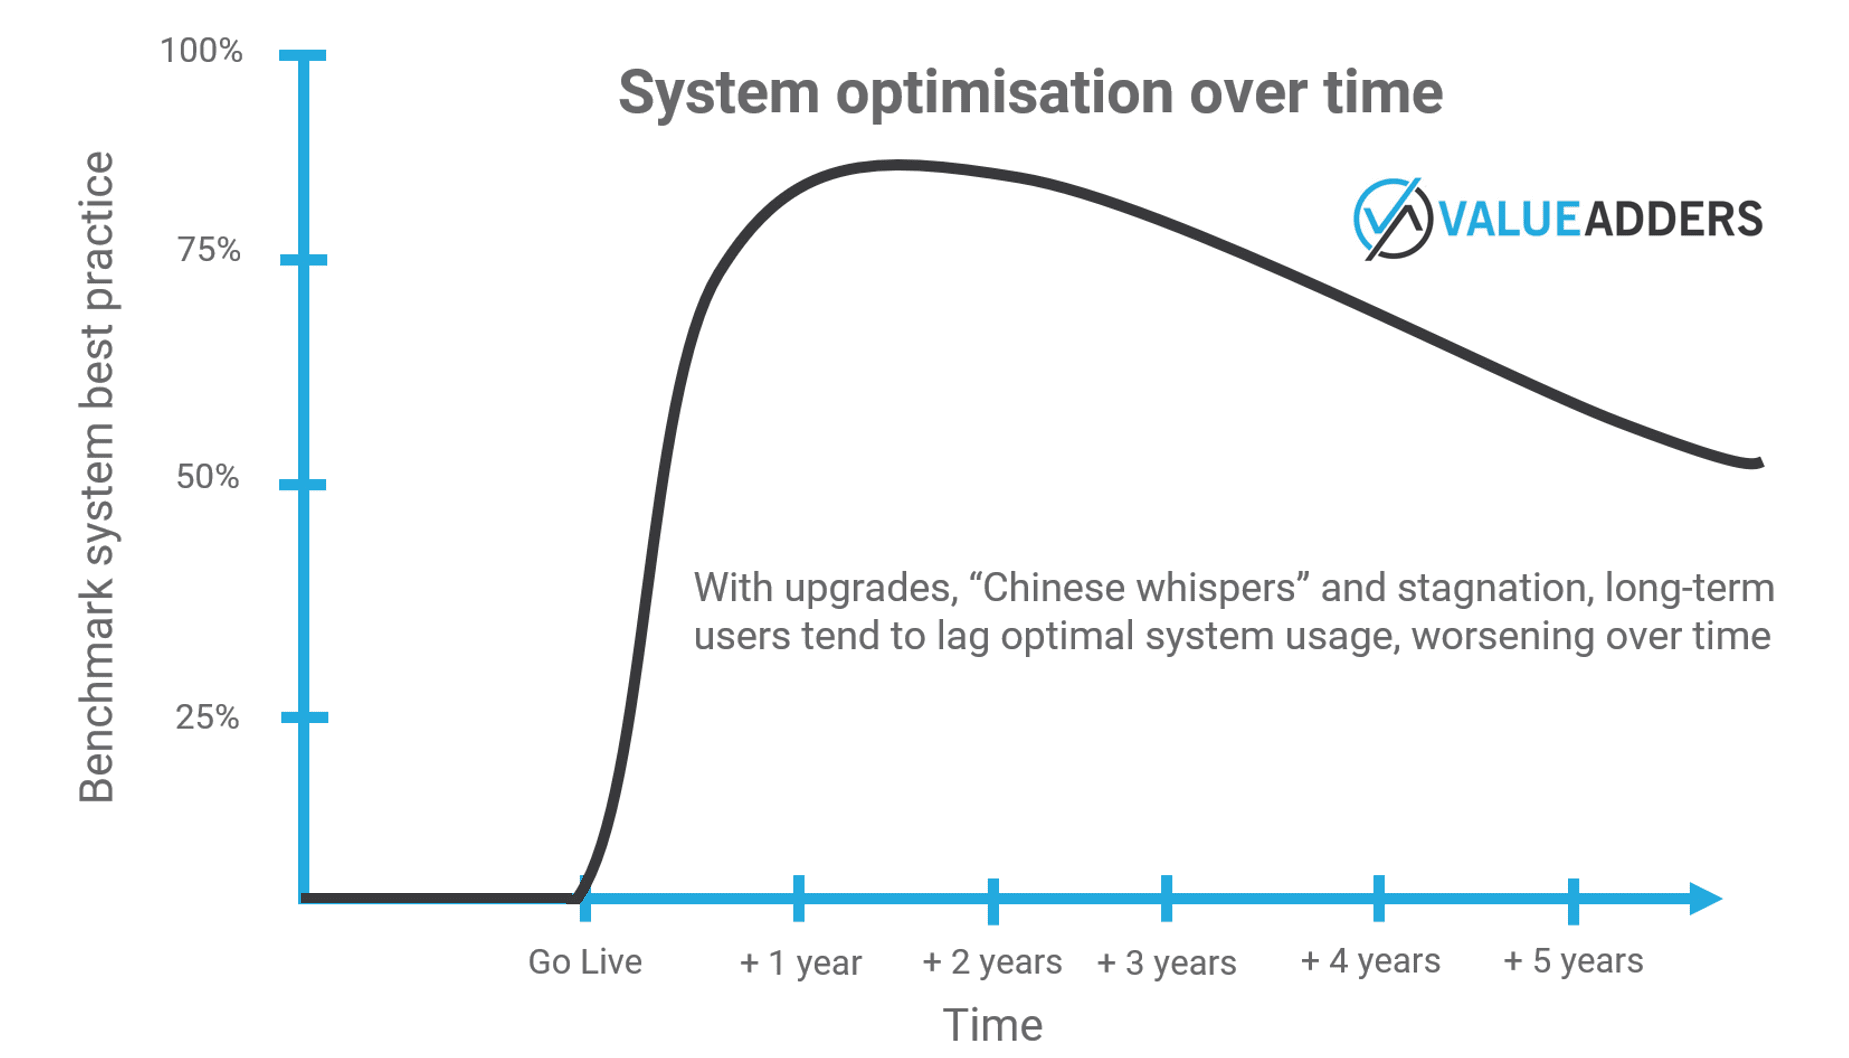 Chart showing software optimisation over time